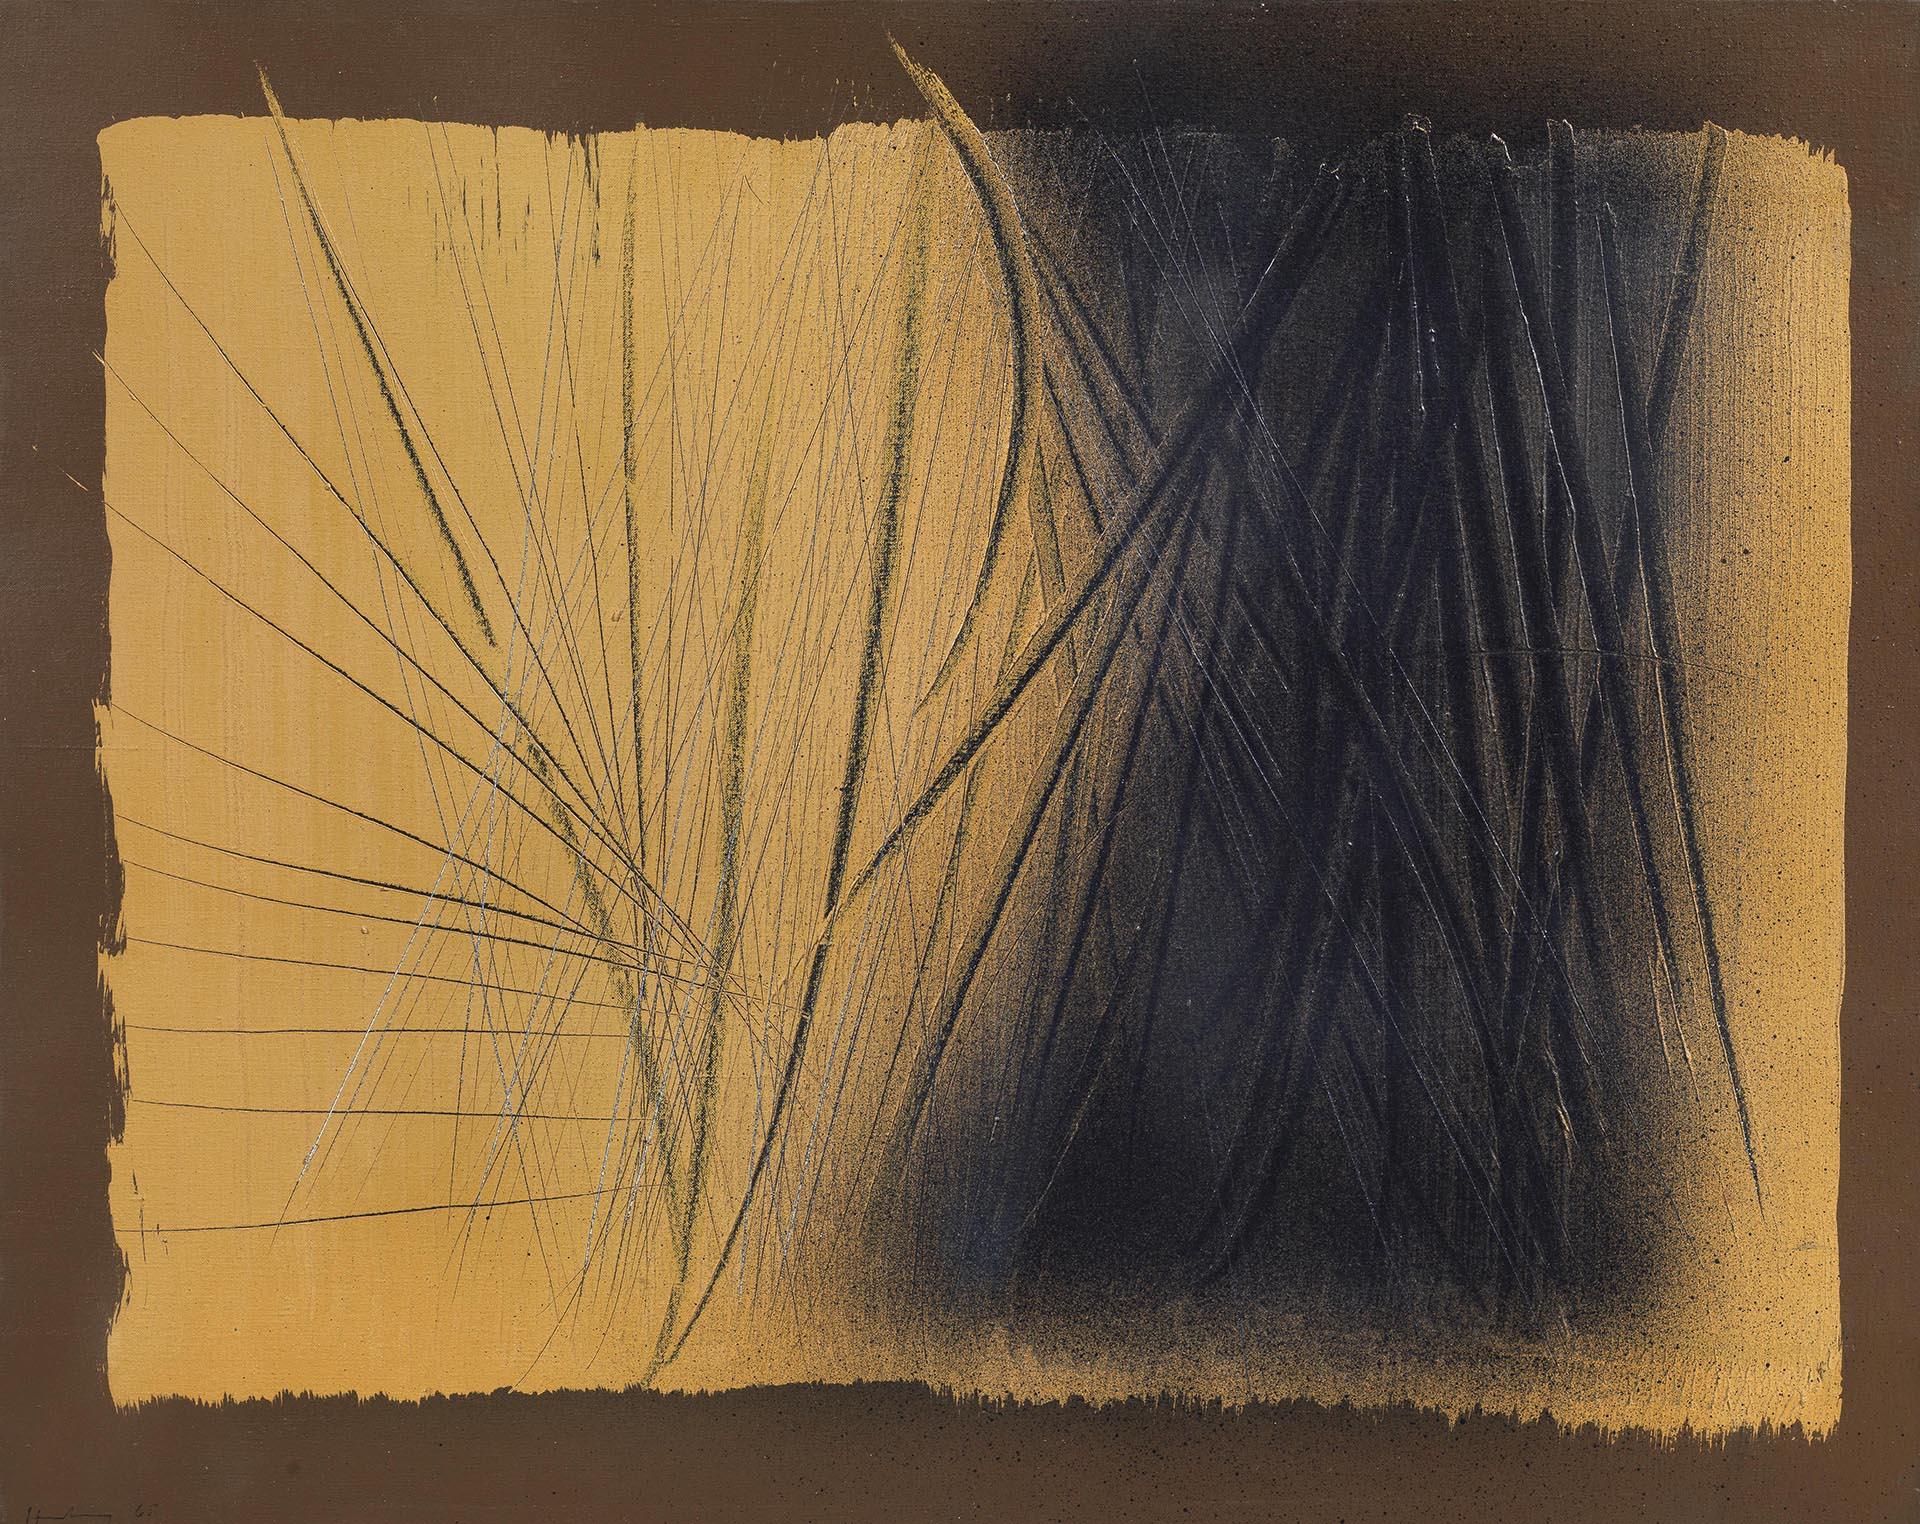 Hartung, T 1965 - H 43, 1965, 65.5x81 cm